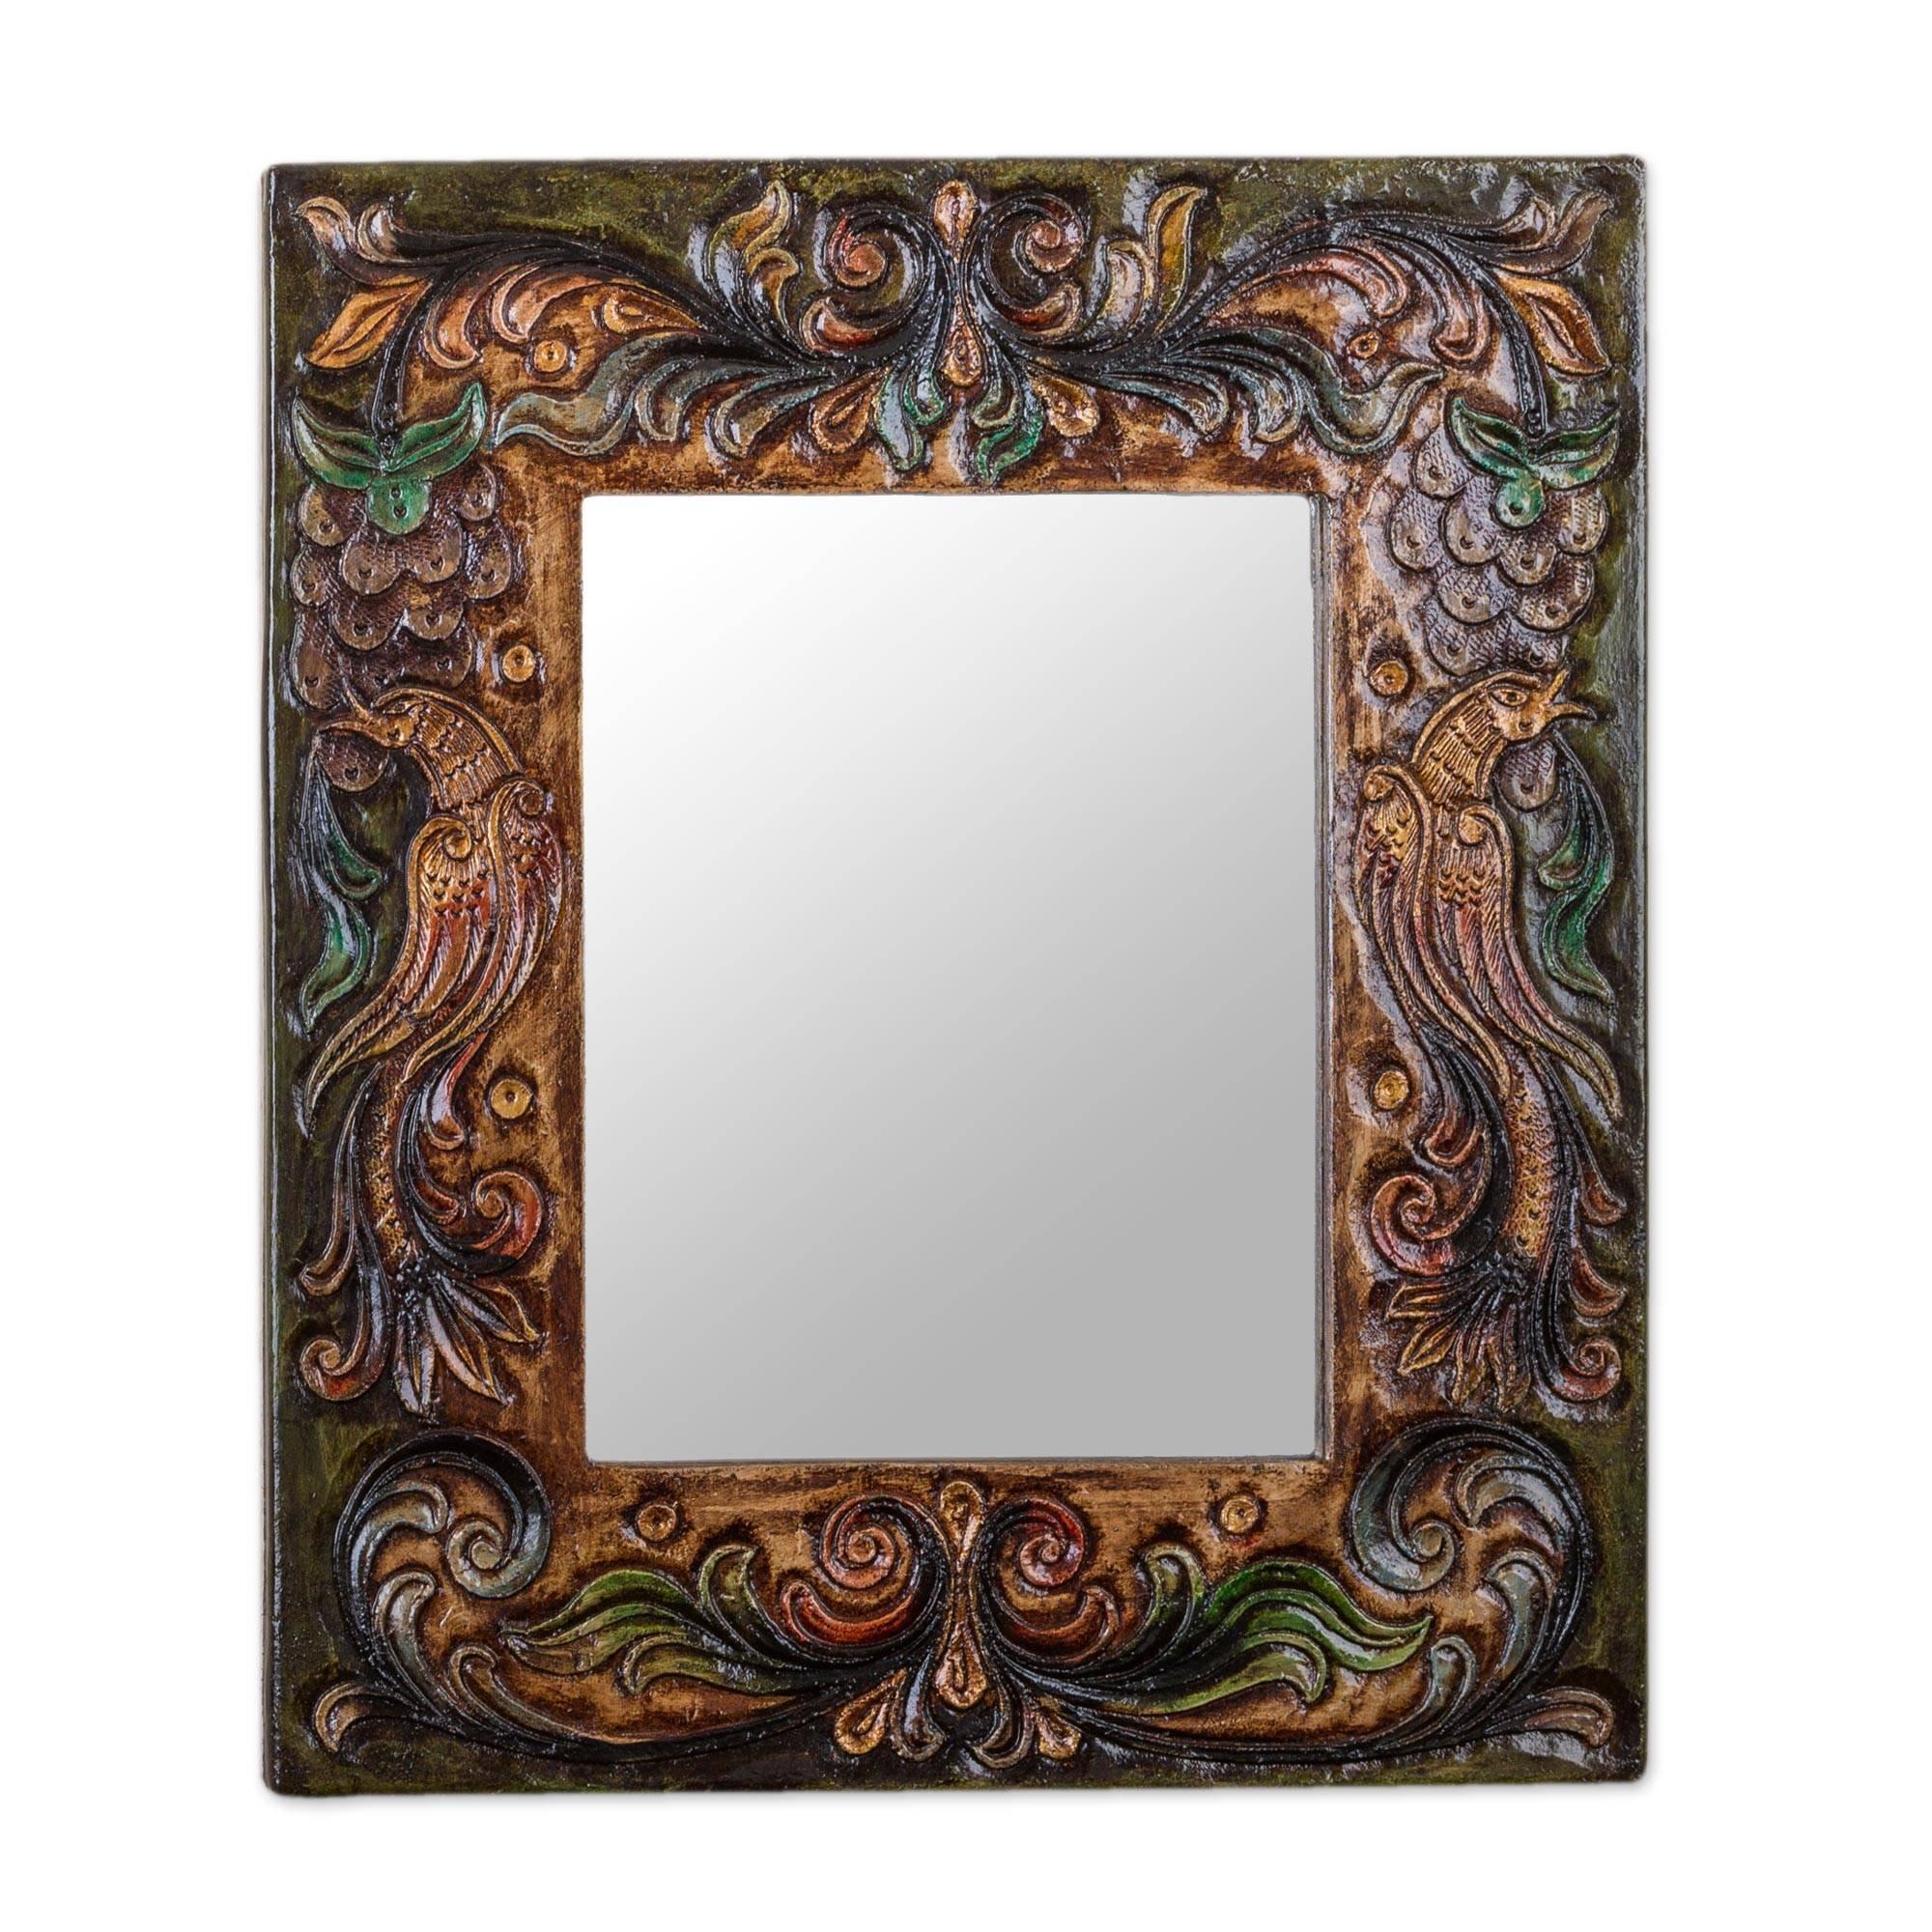 NOVICA Animal Themed Wood Wall Mounted Mirror, Multicolor 'Enchanted Reflection'